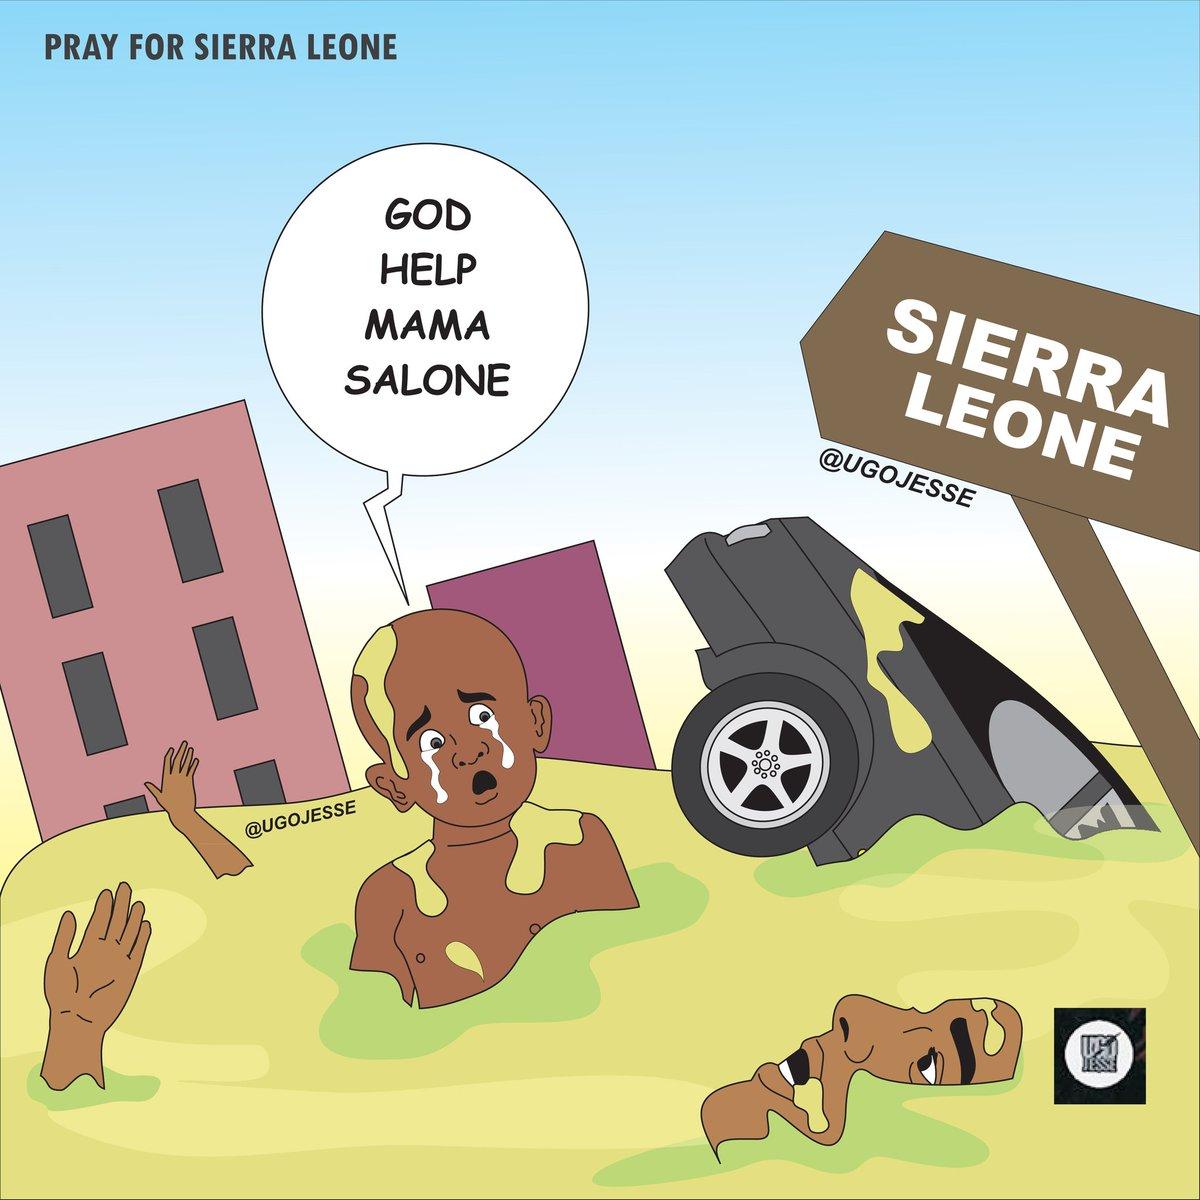 Jesse - Sierra Leone